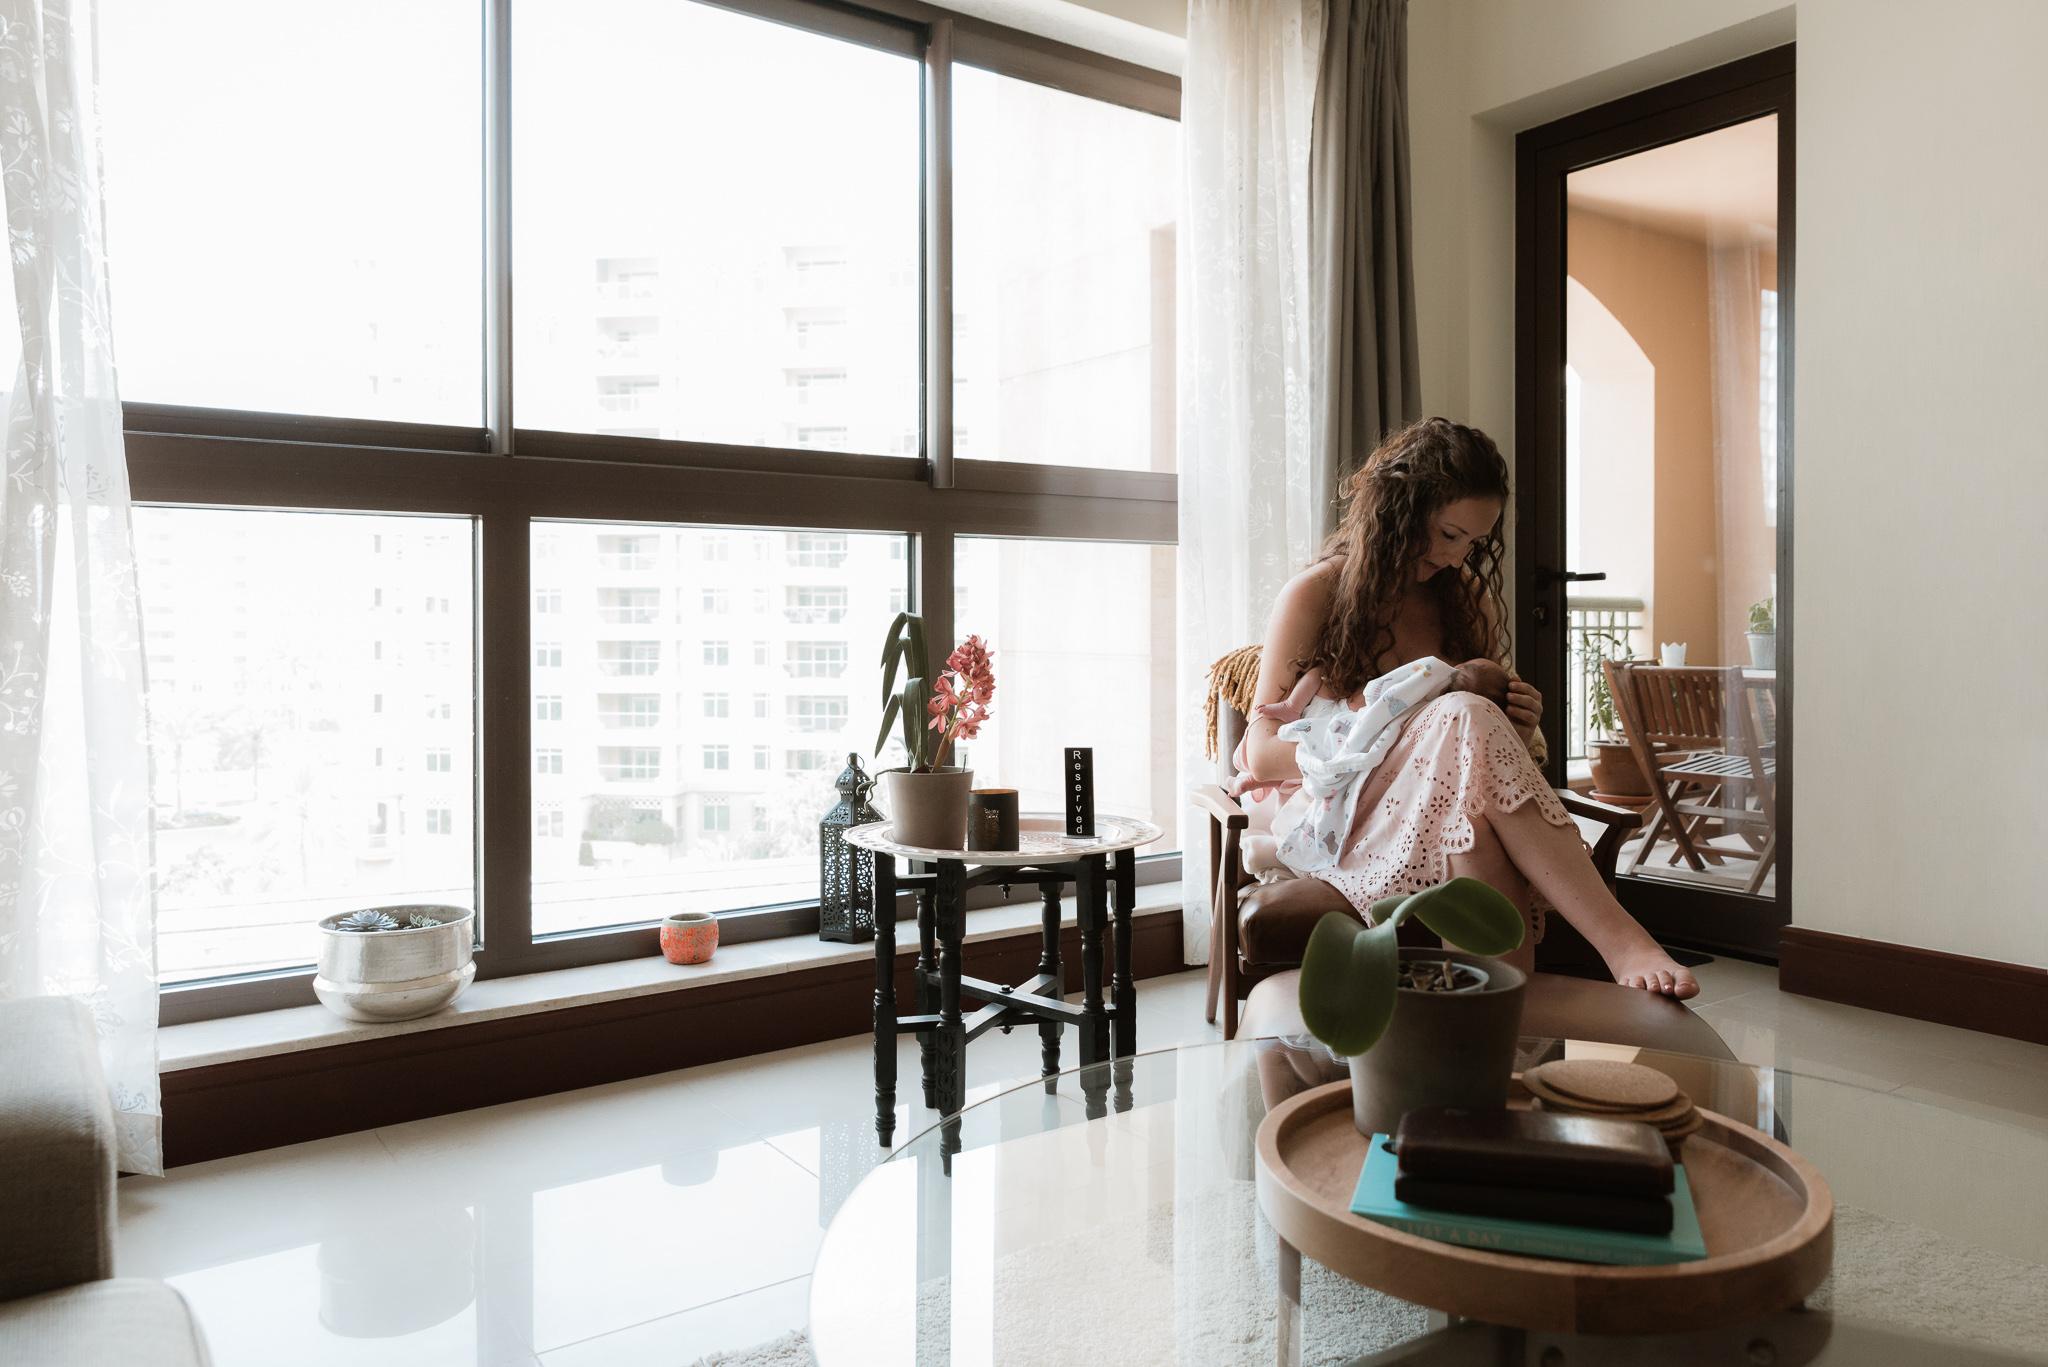 Lana-Photographs-Dubai-Newborn-Photographer-Katrin-PSLR-16.jpg